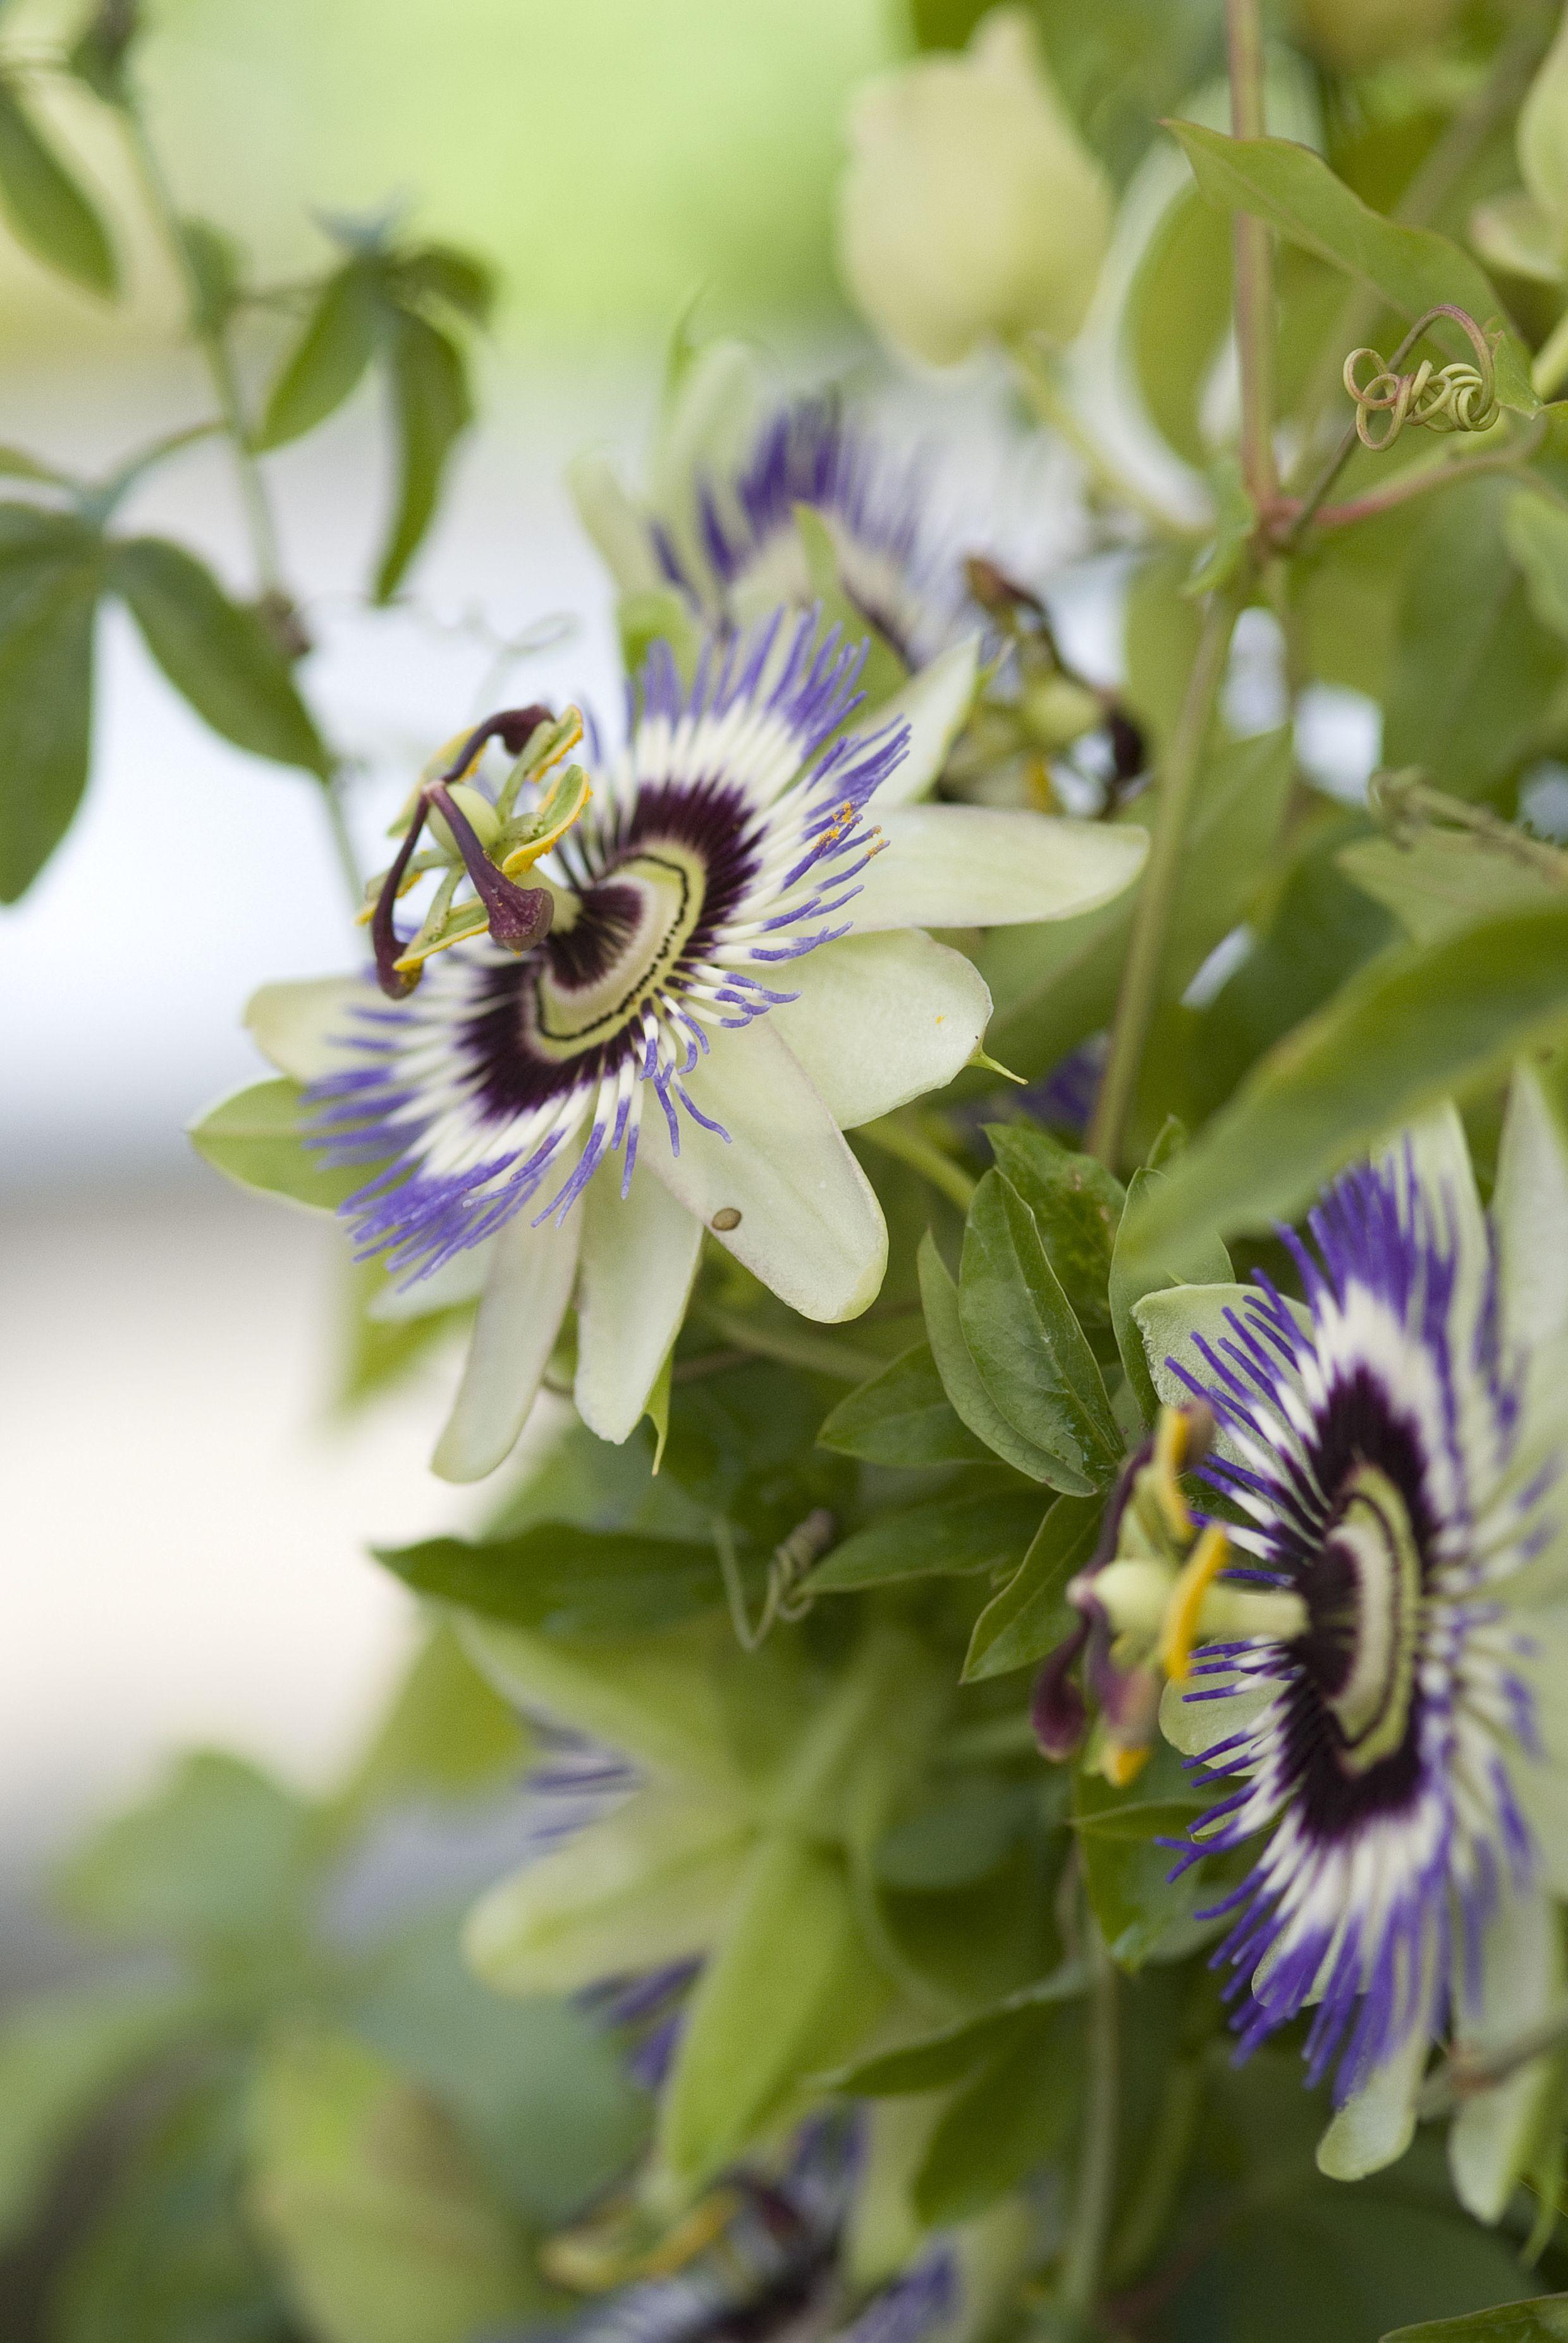 Passiflora Caerulea Blauwe Passiebloem Blaue Passionsblume Blue